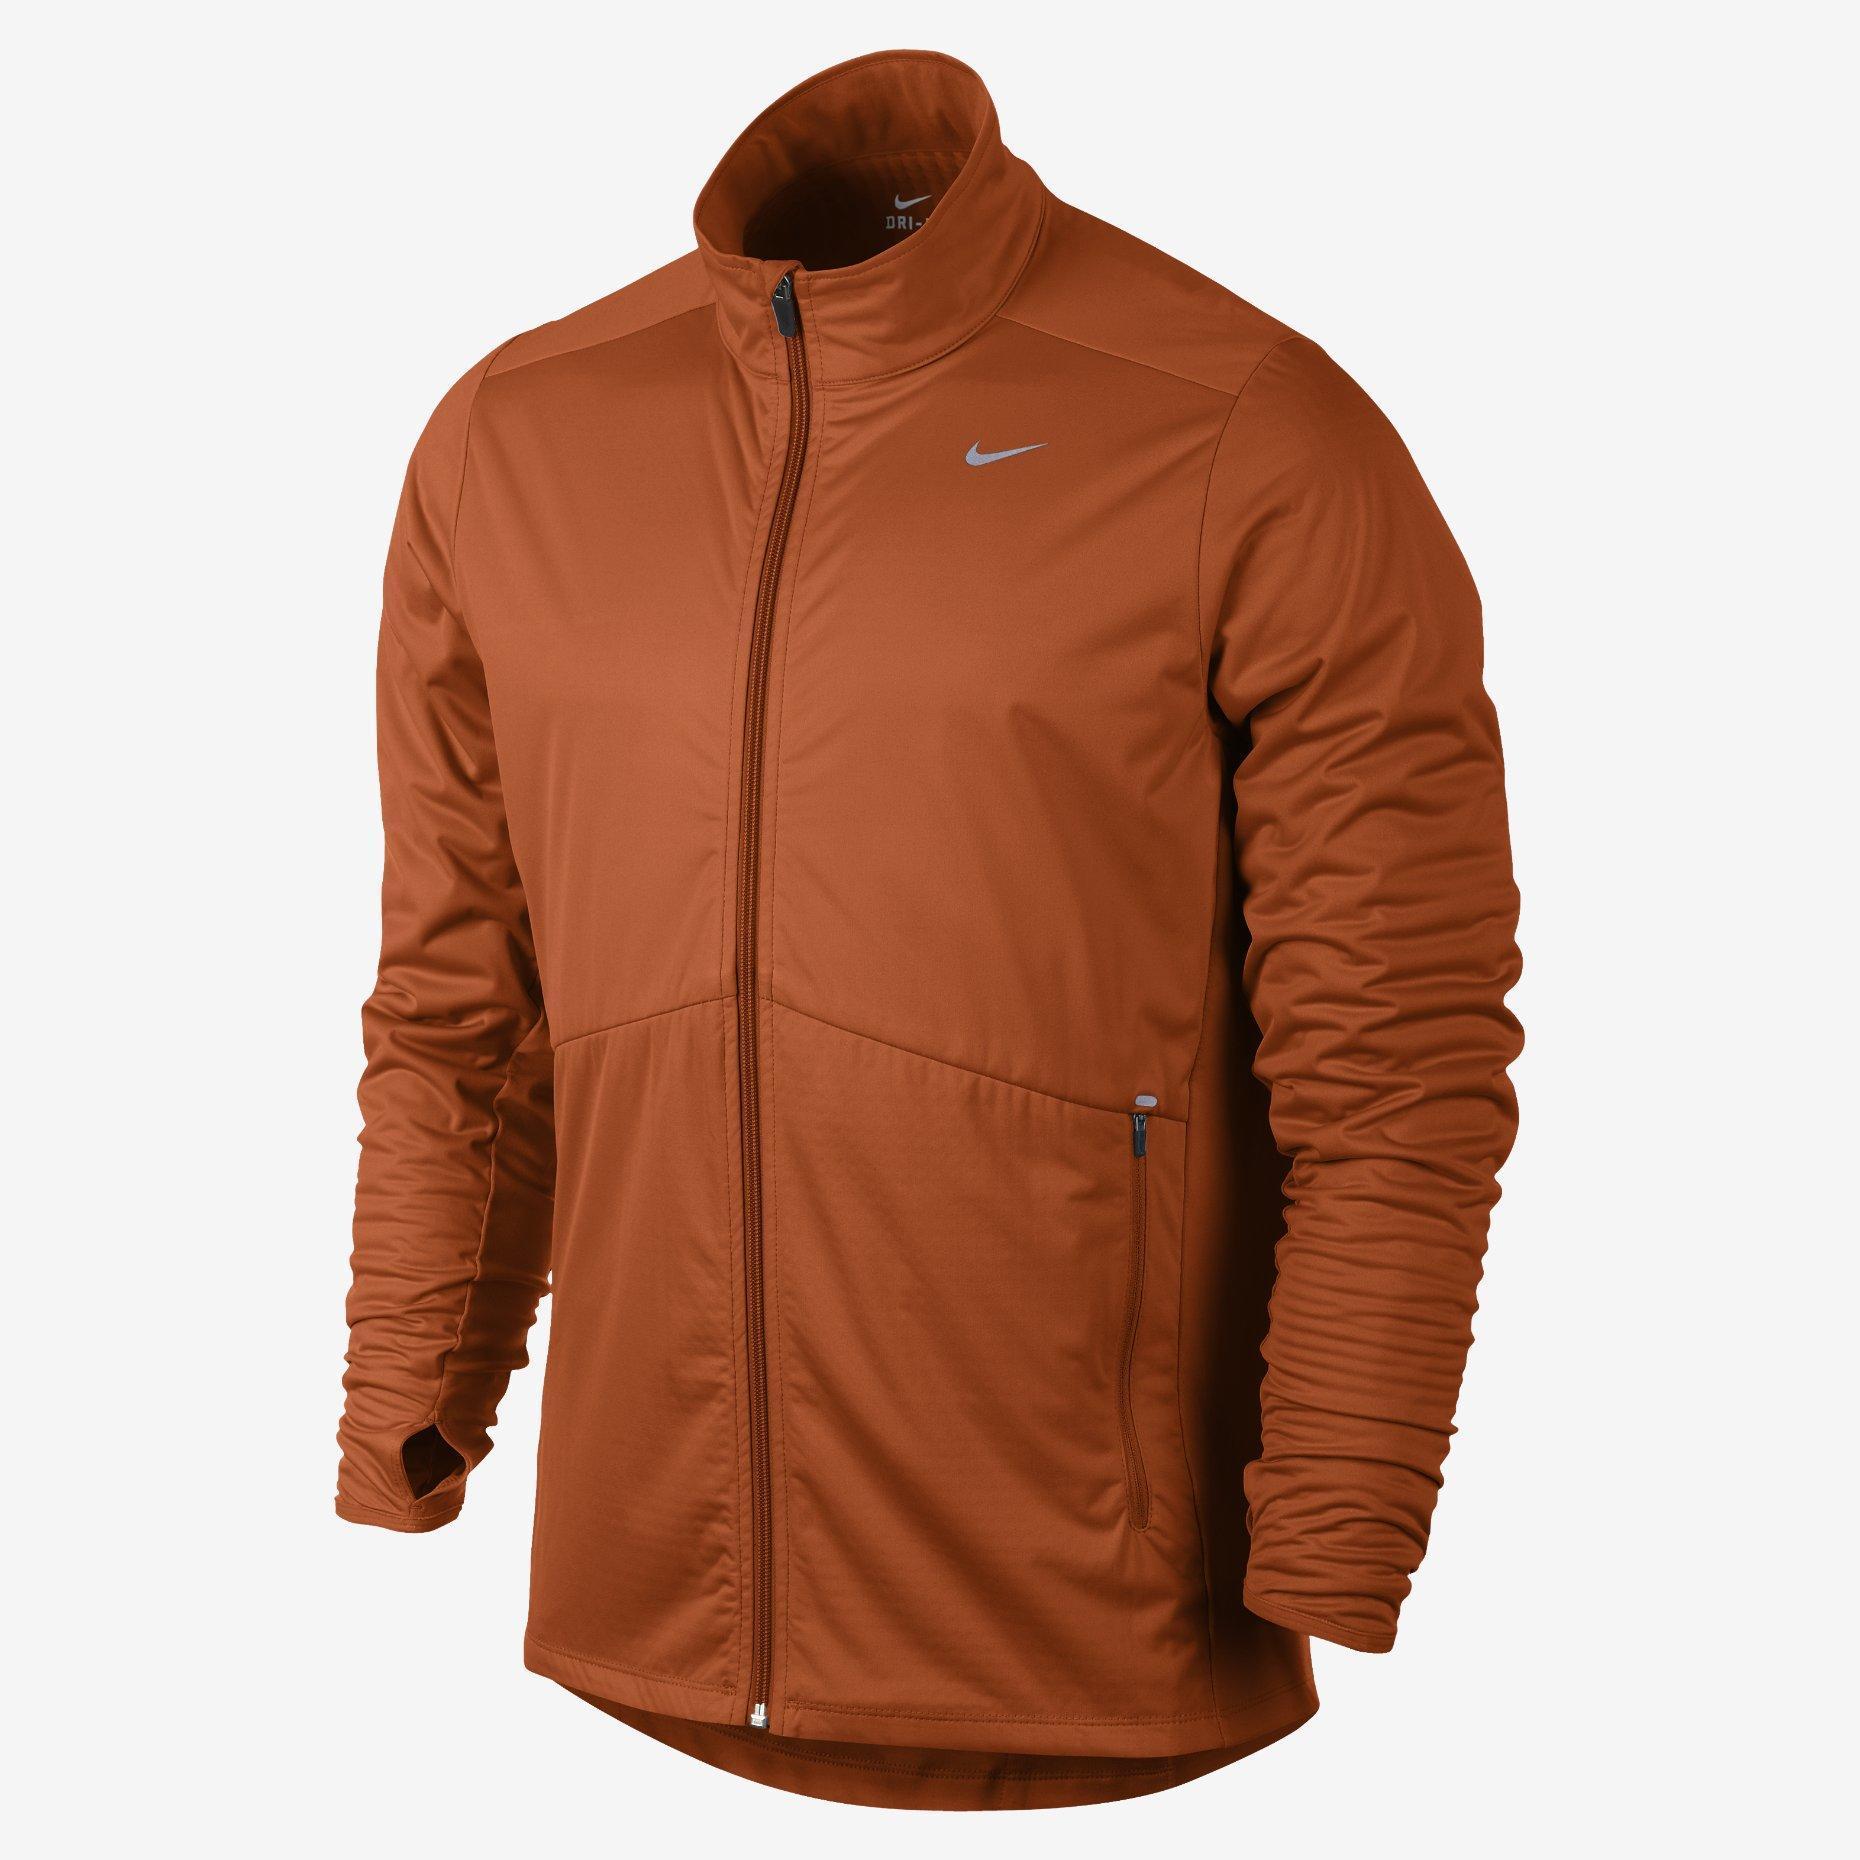 fc8bb2a5e17a Nike Mens Element Shield FZ Running Jacket - Orange Reflective Silver -  Tennisnuts.com